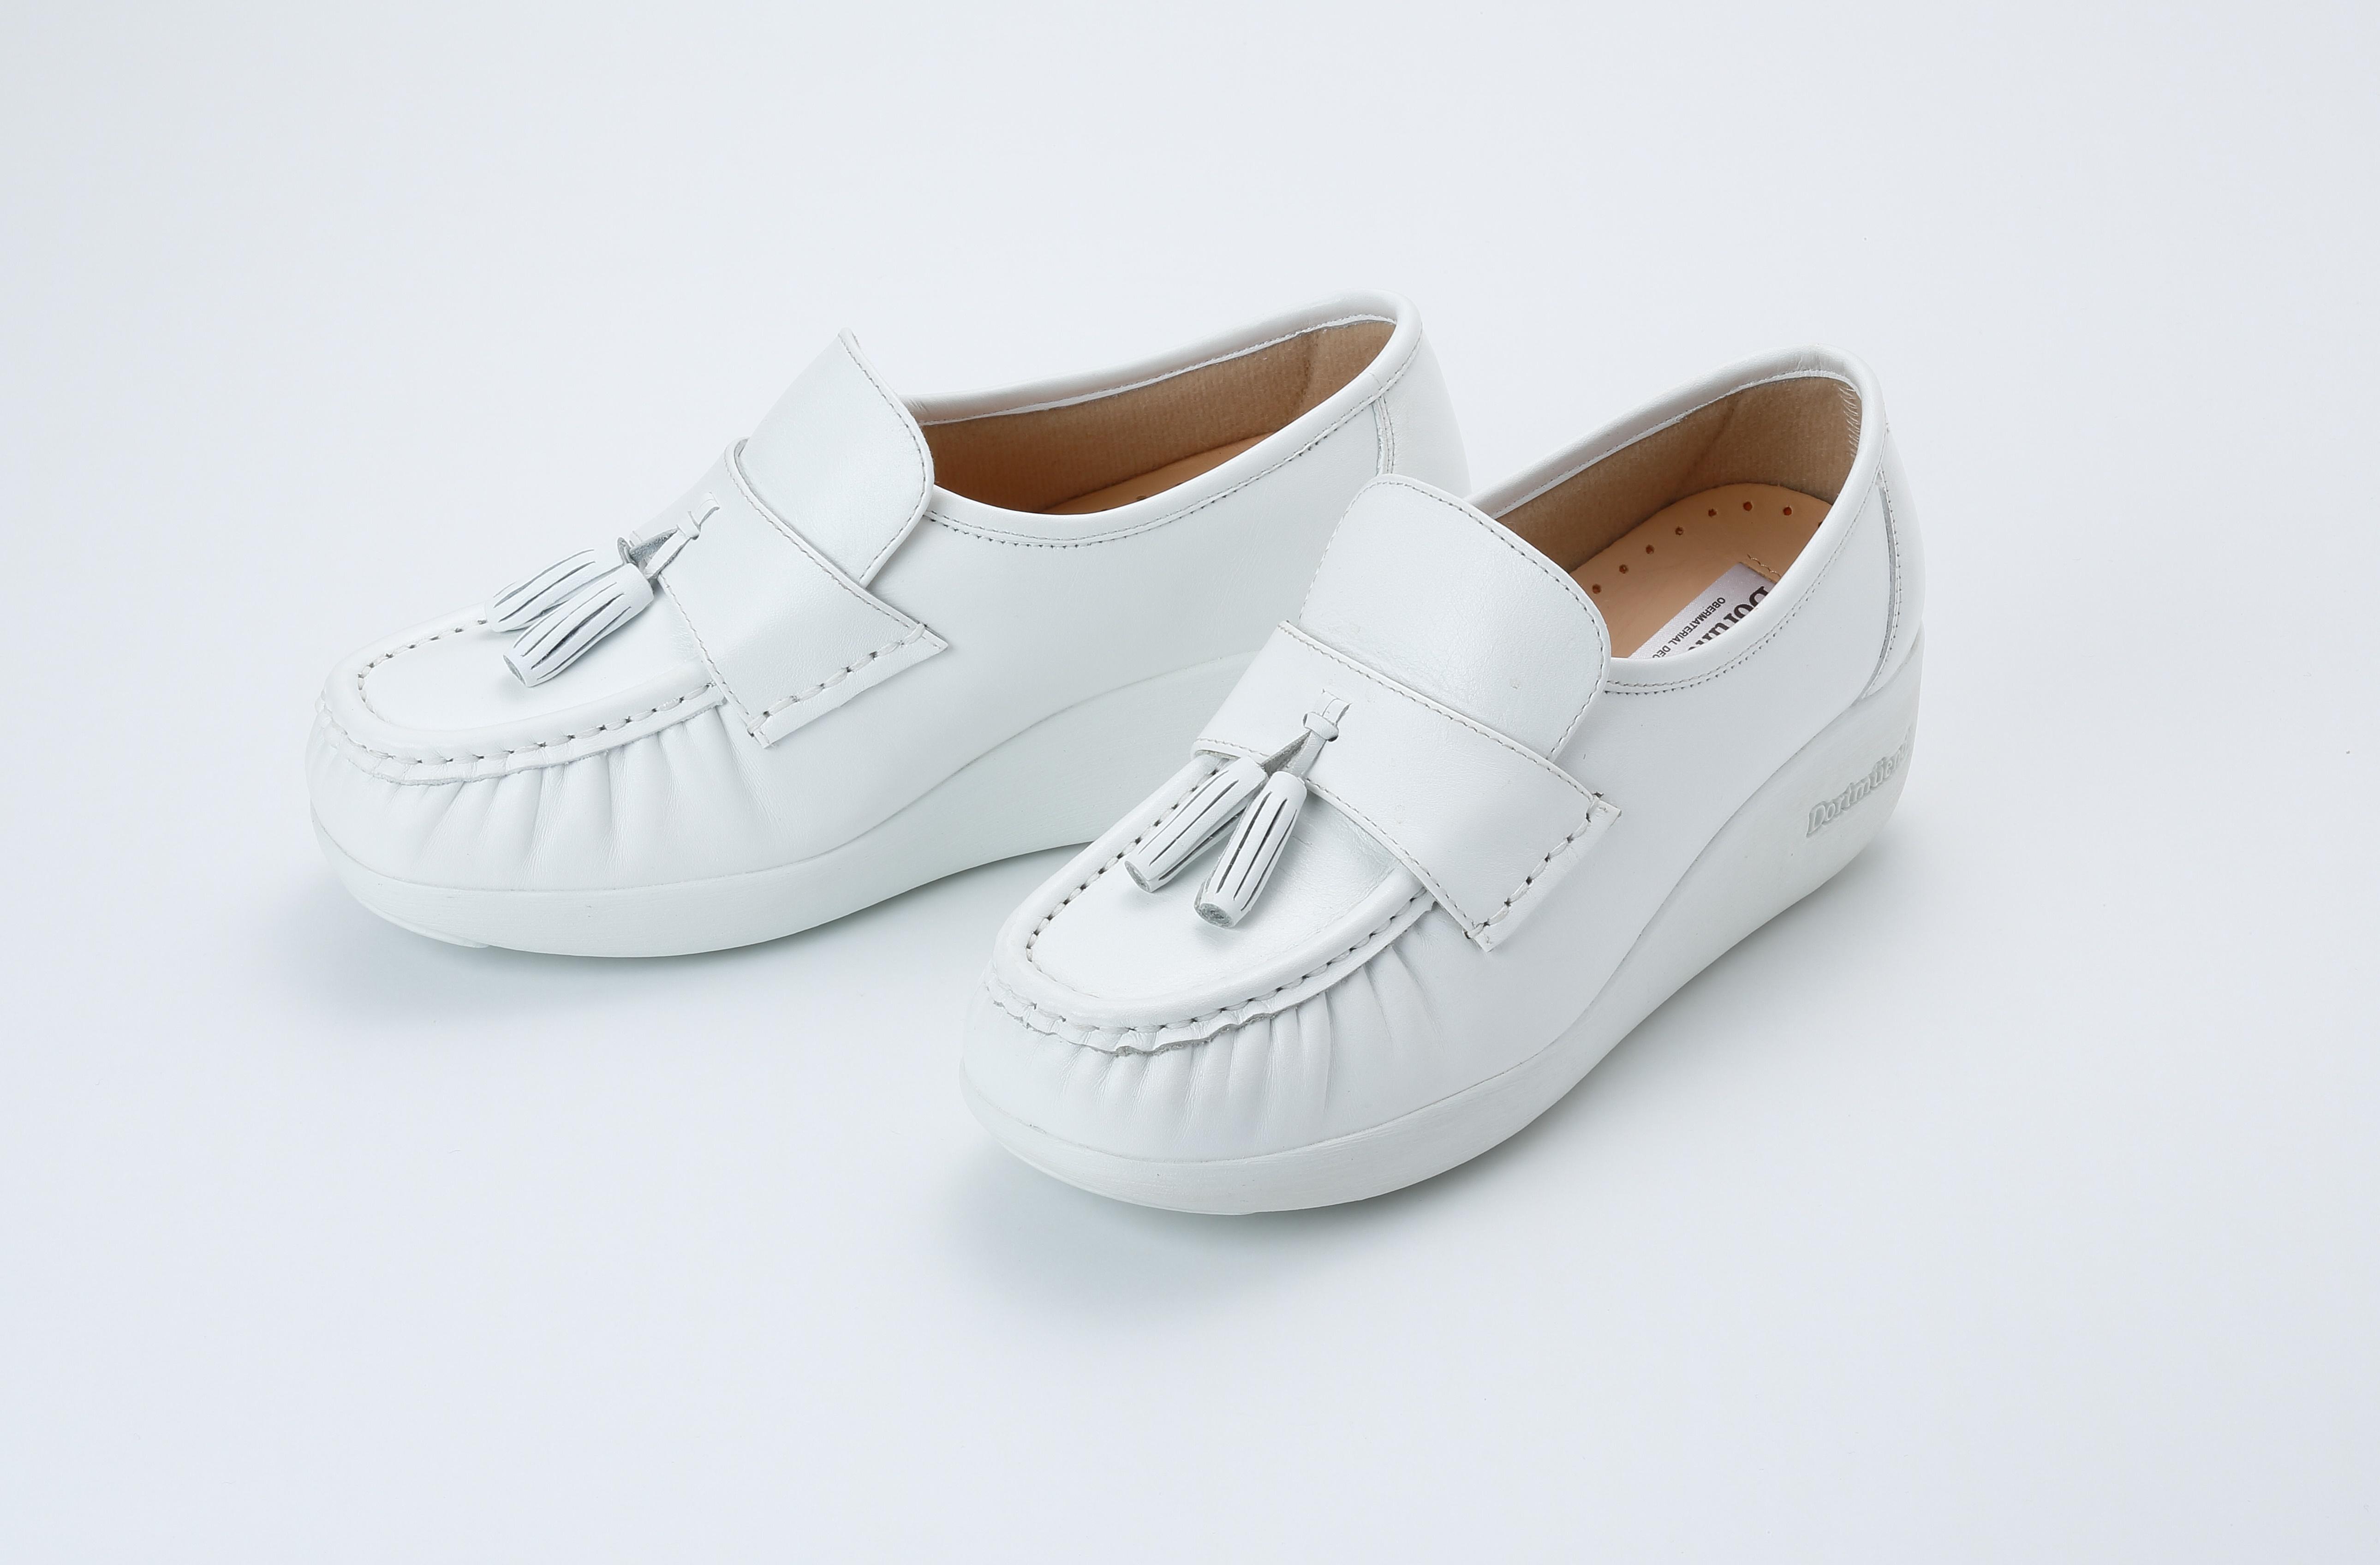 Js901-White Dortmuend Proseries รองเท้าสุขภาพ รองเท้าหมอ รองเท้าพยาบาล รองเท้าครู รองเท้าเชฟ รองเท้าเดินนาน ยืนนาน.